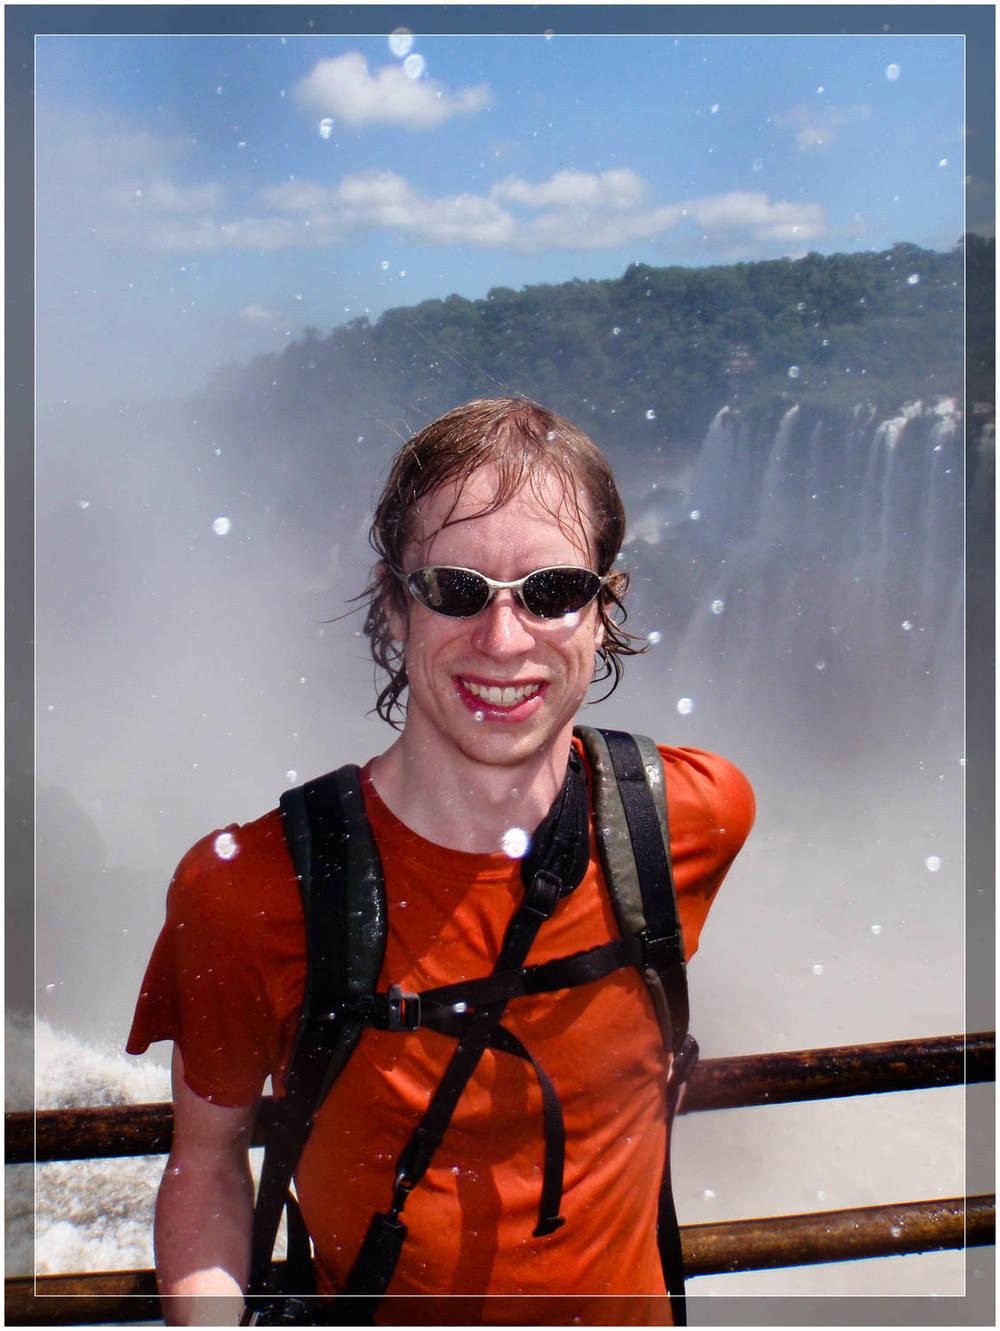 Soaked in Iguazu - Argentina (c) Dustin Main 2010